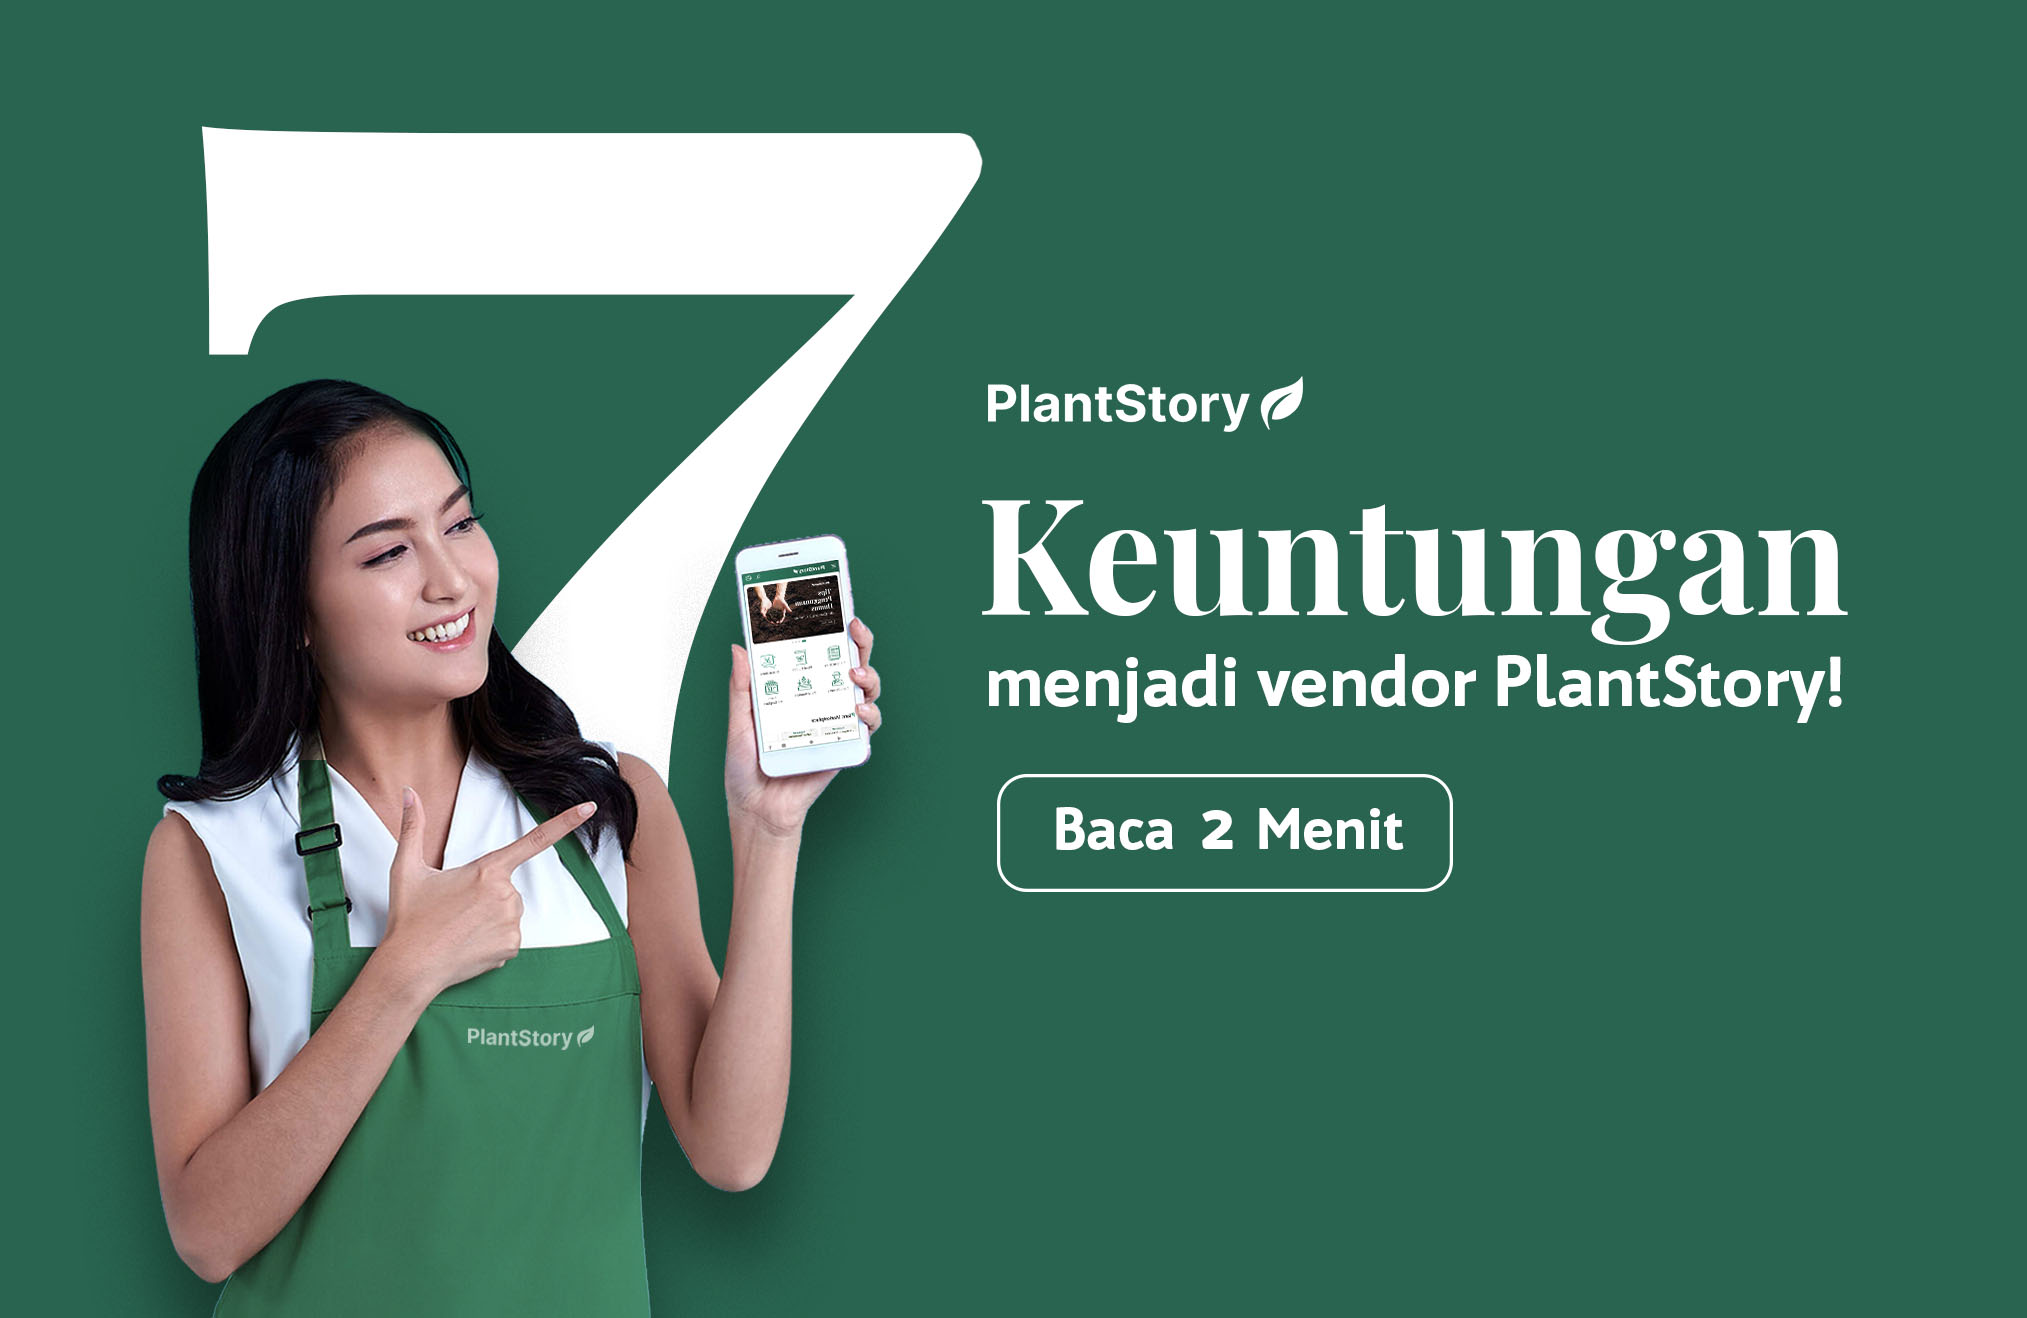 7 Keuntungan Menjadi Vendor PlantStory!